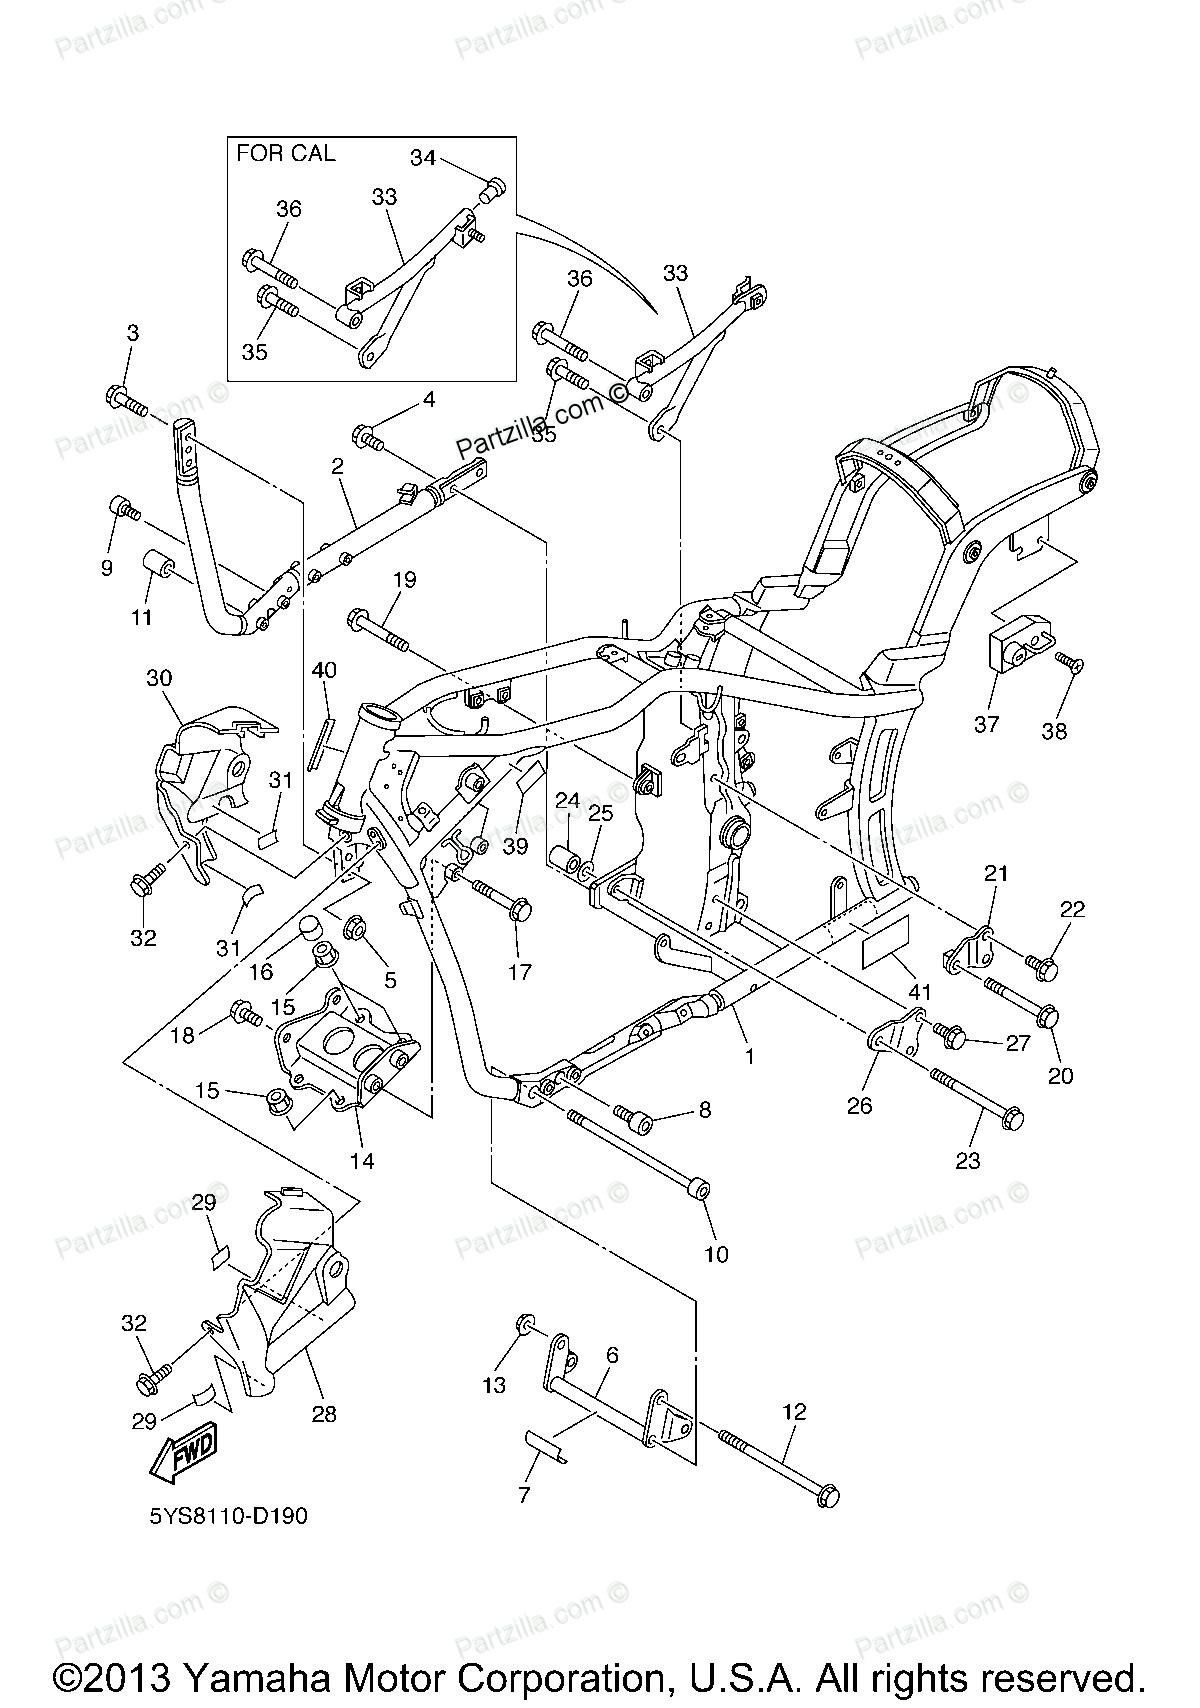 [TBQL_4184]  WG_0305] O2 Sensor Location Wiring Diagram Photos For Help Your Working Wiring  Diagram | 2003 Cts O2 Wiring Diagram |  | Eachi Xorcede Mohammedshrine Librar Wiring 101